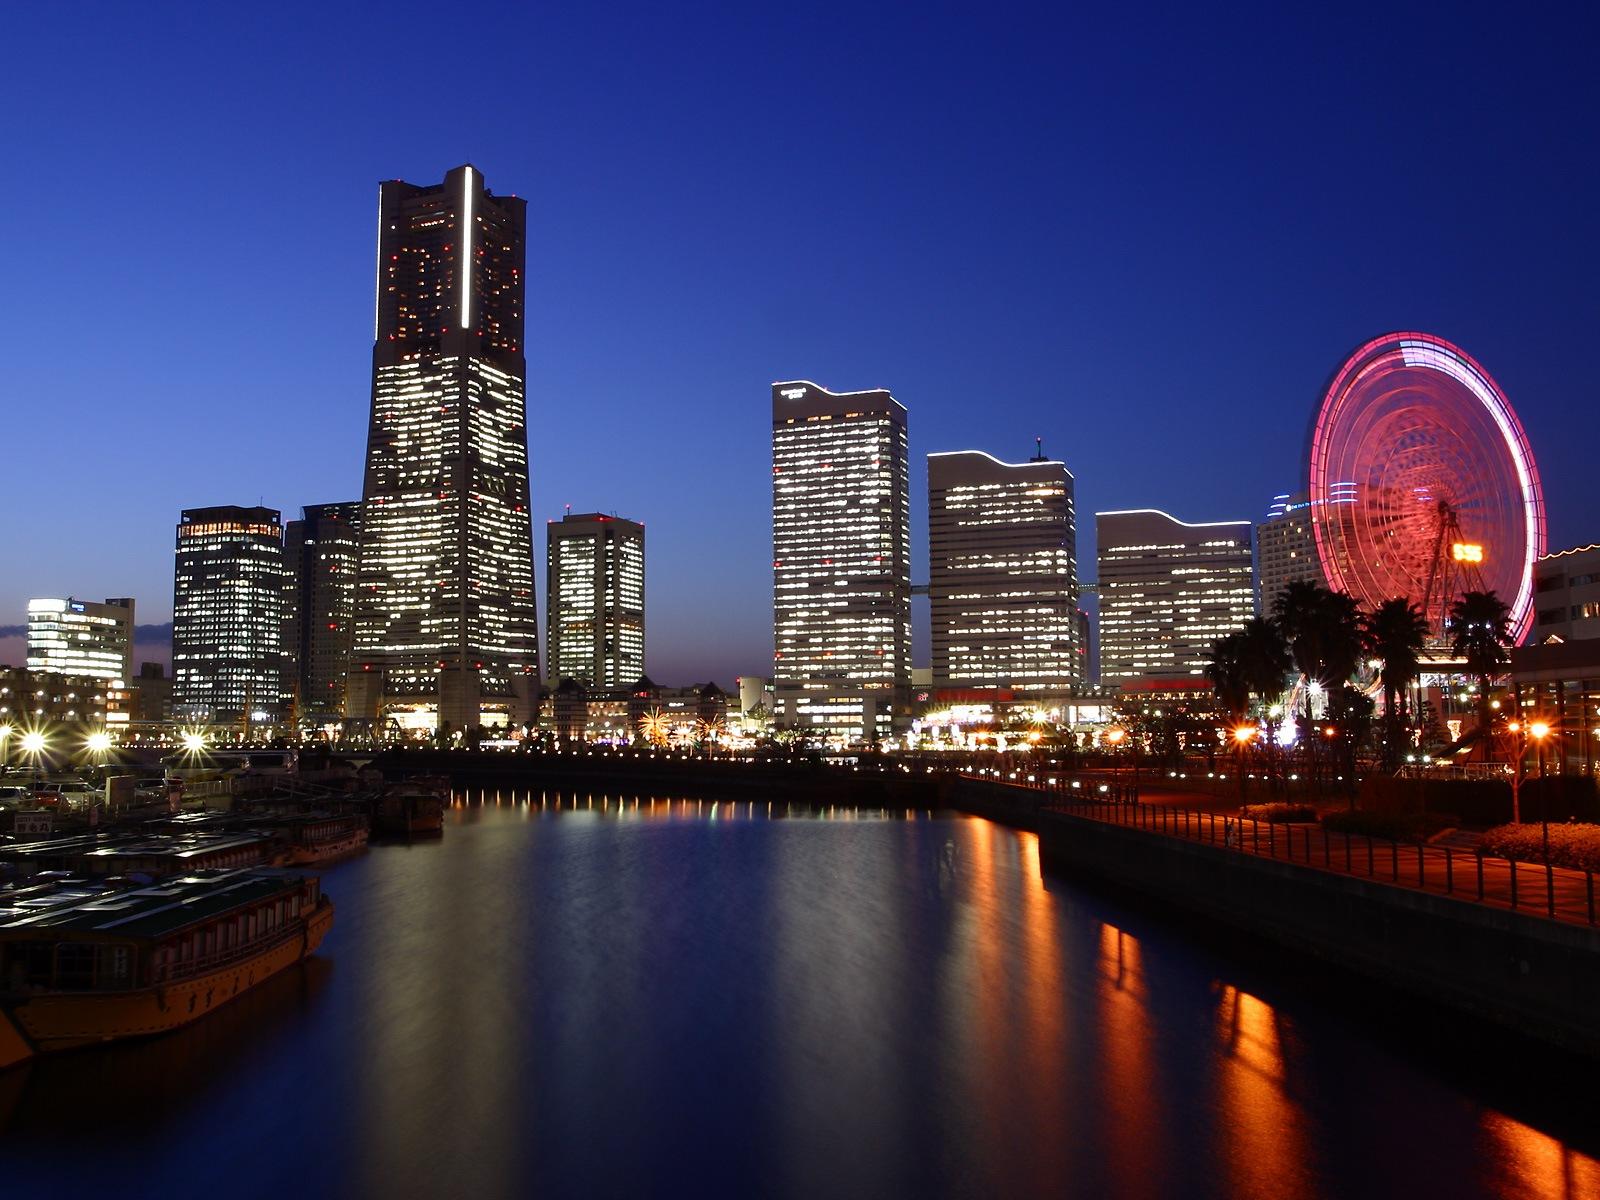 http://1.bp.blogspot.com/-pbskOHiD5-U/TadCXCHYfYI/AAAAAAAAAWo/pFSBub-bYN0/s1600/tokyo-by-night-japan-5940.jpg